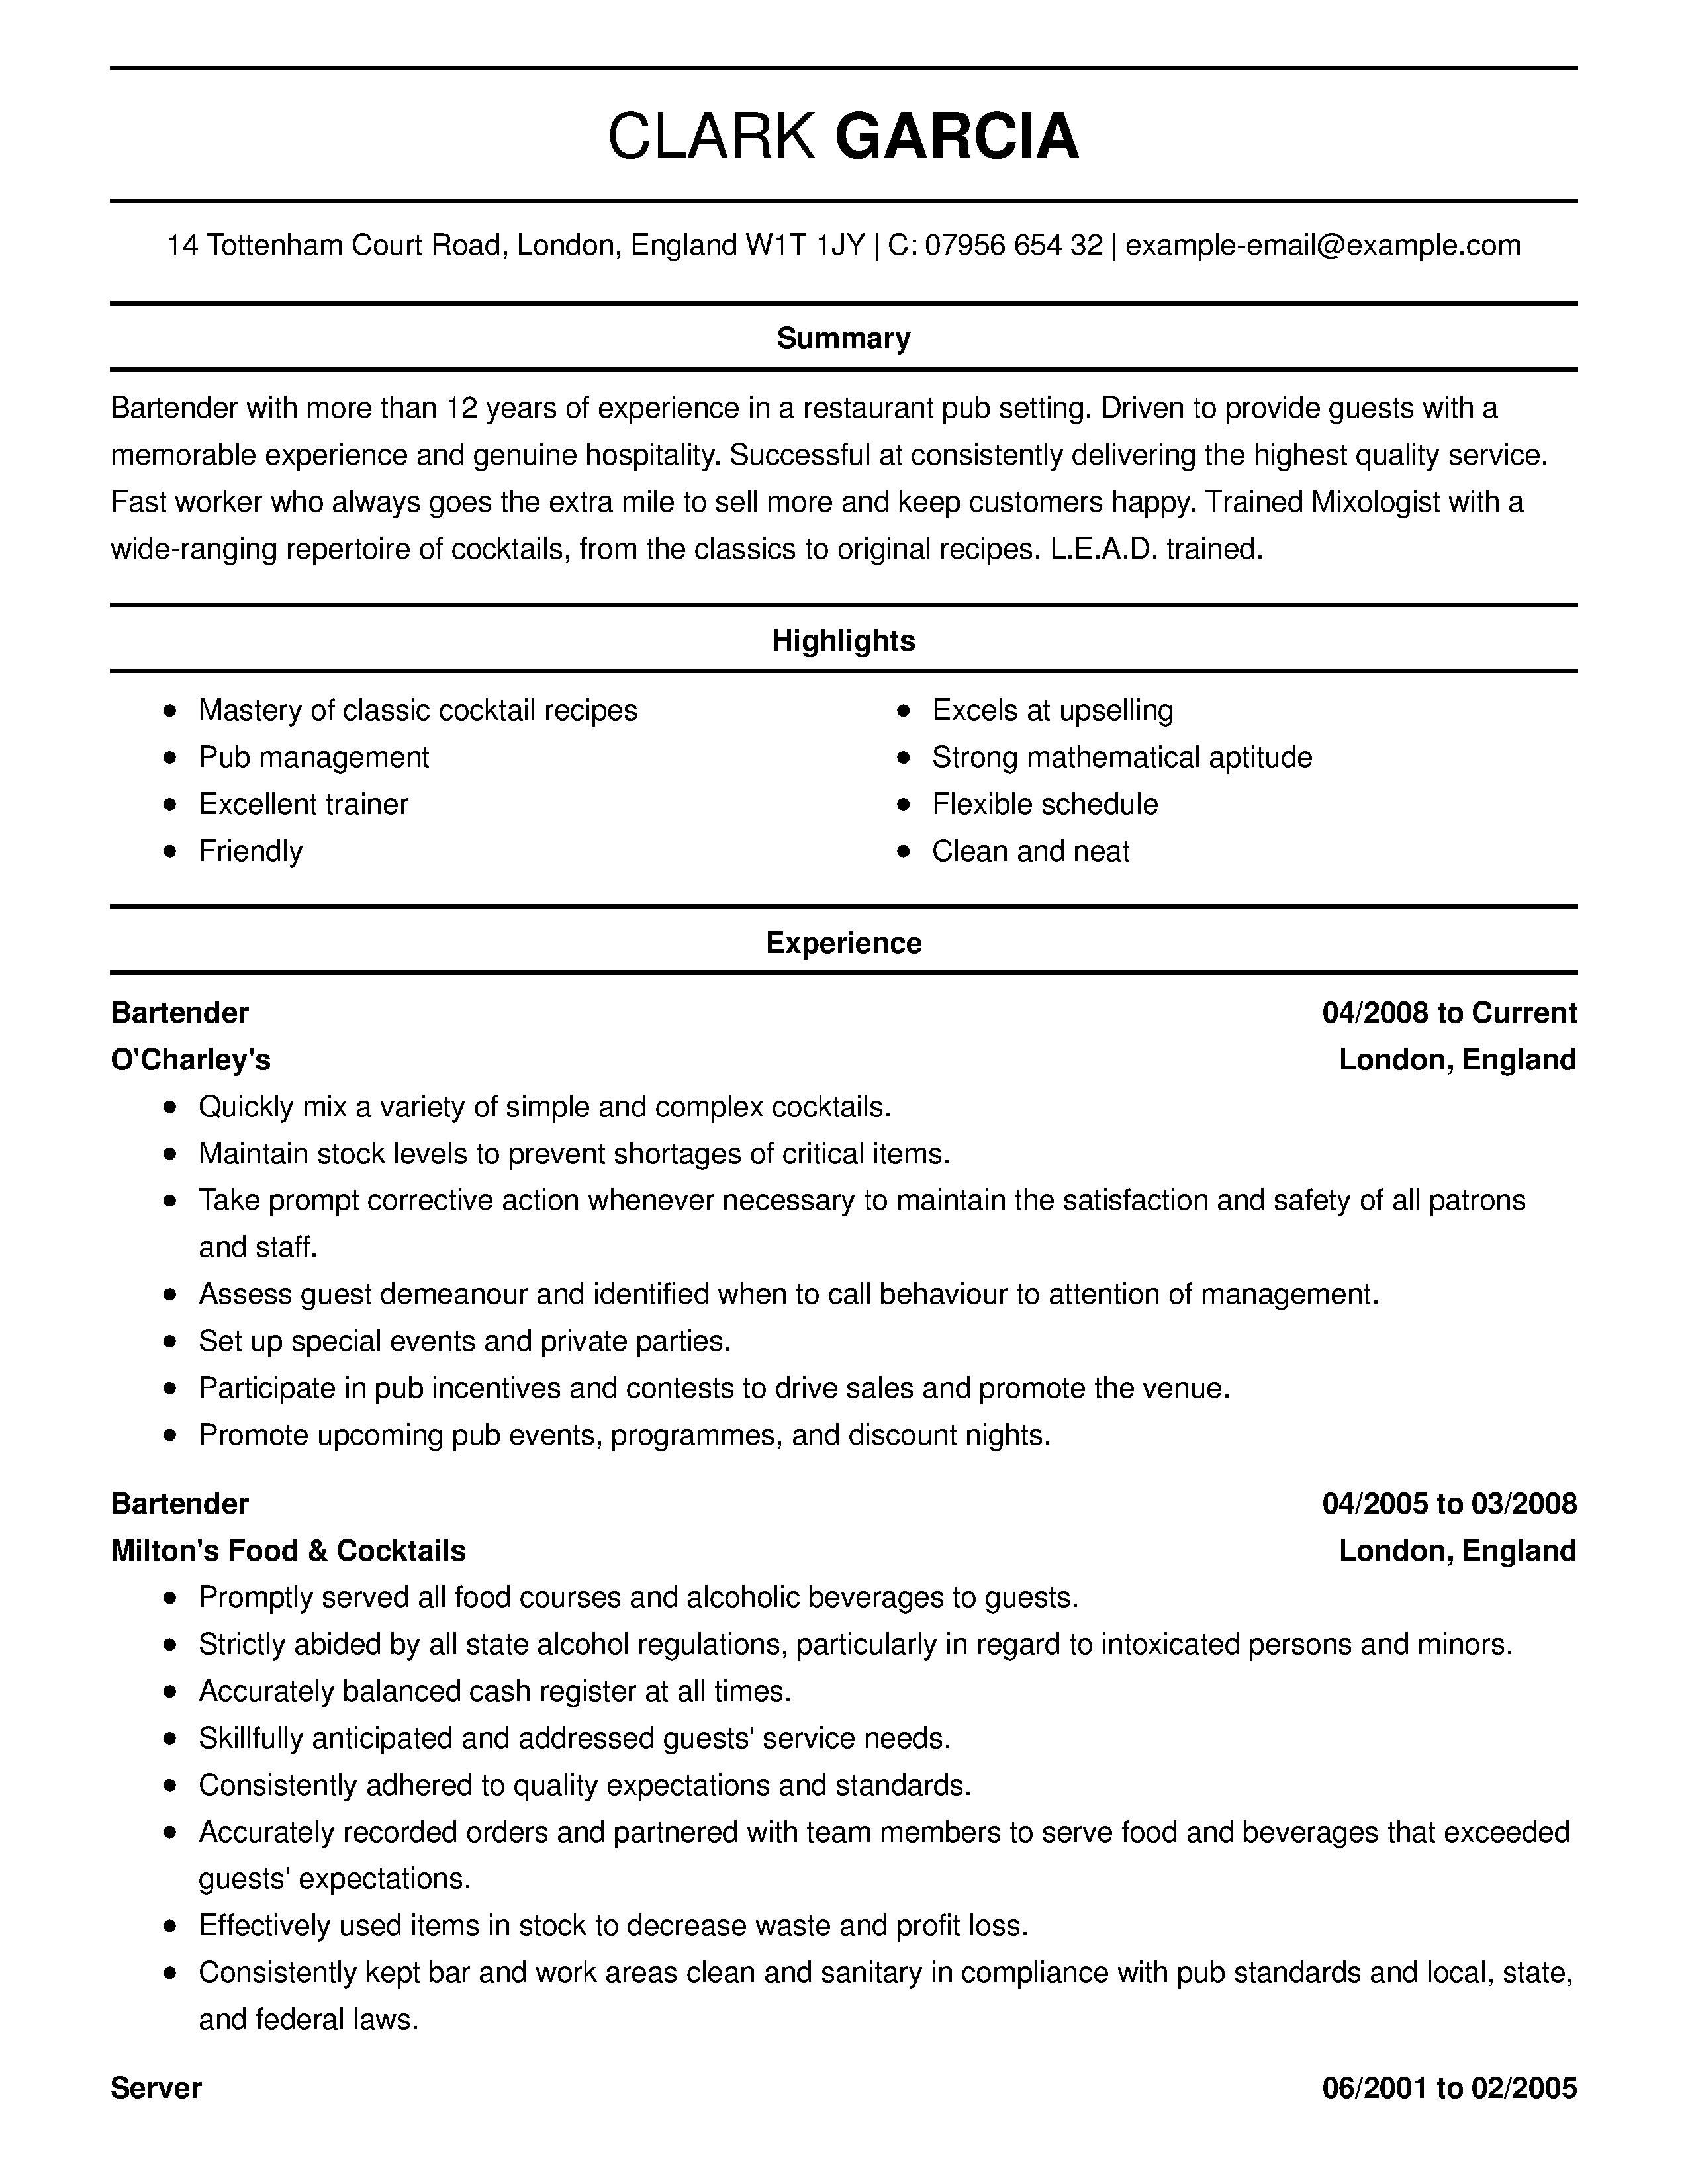 professional bartender resume sles Resume skills, Resume